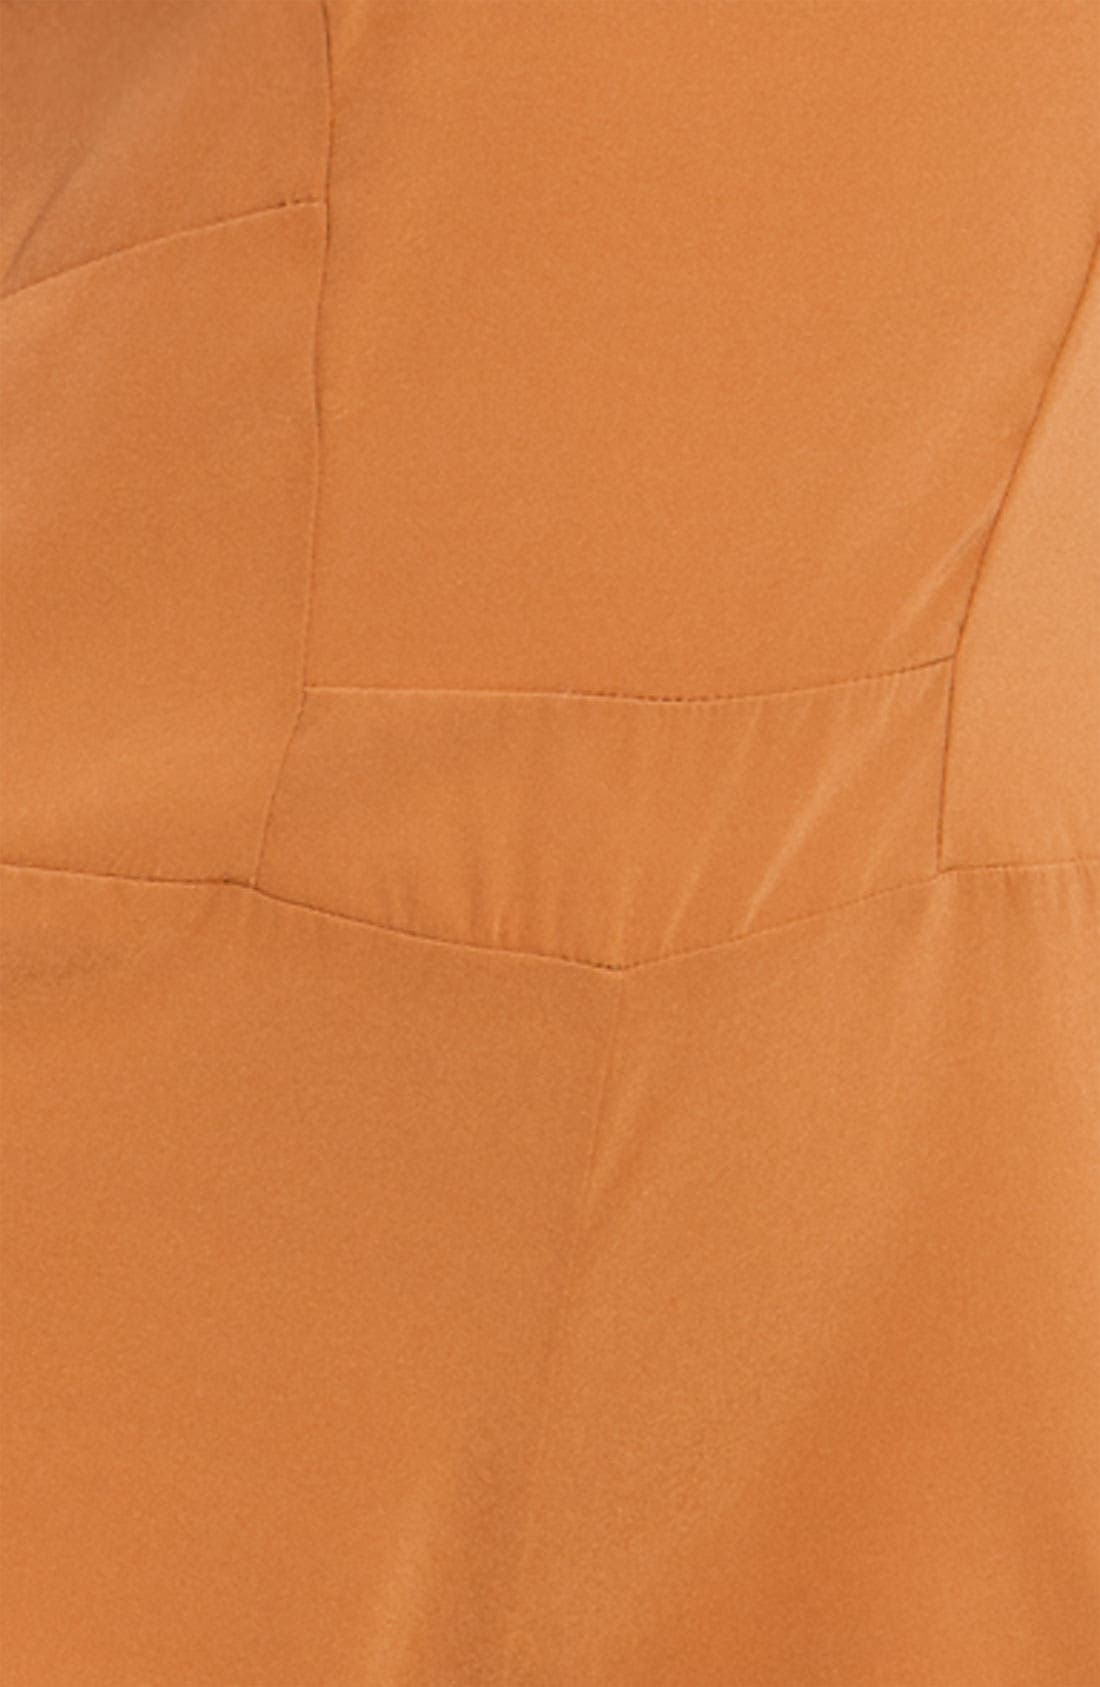 'Chelsea' Silk Teddy,                             Alternate thumbnail 3, color,                             710